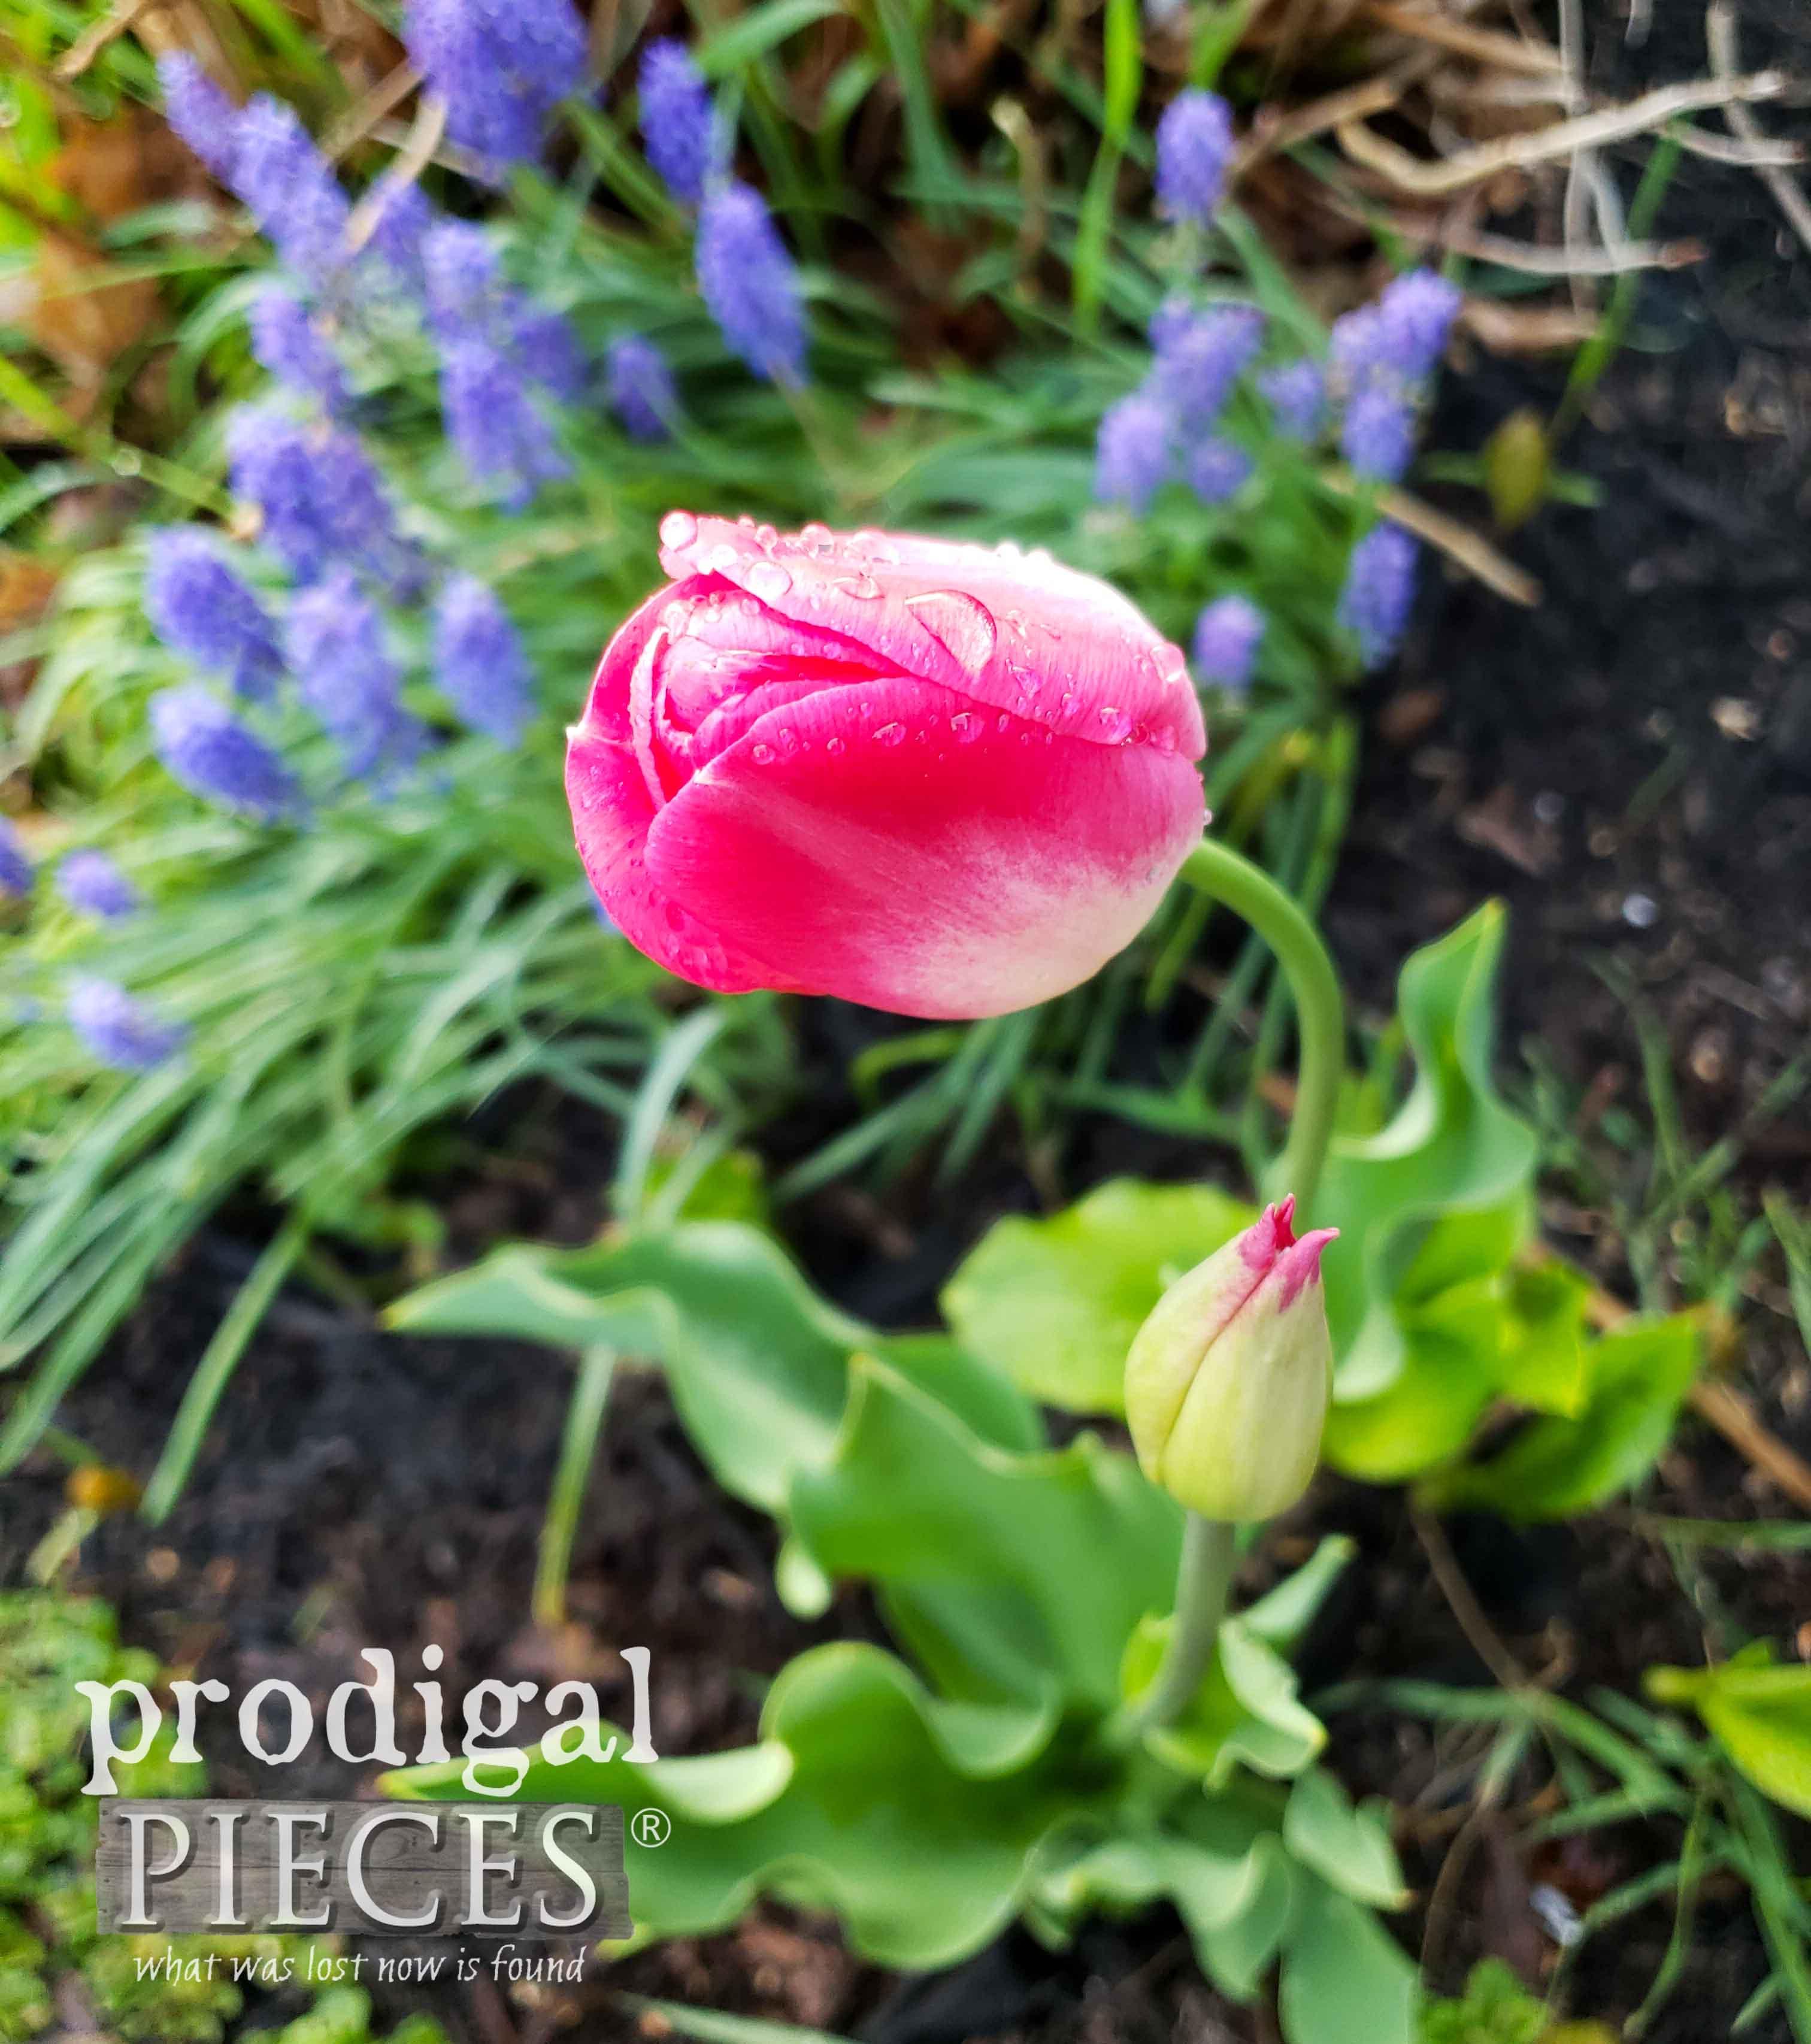 Pink Tulip in Garden Bed | prodigalpieces.com #prodigalpieces #flower #pink